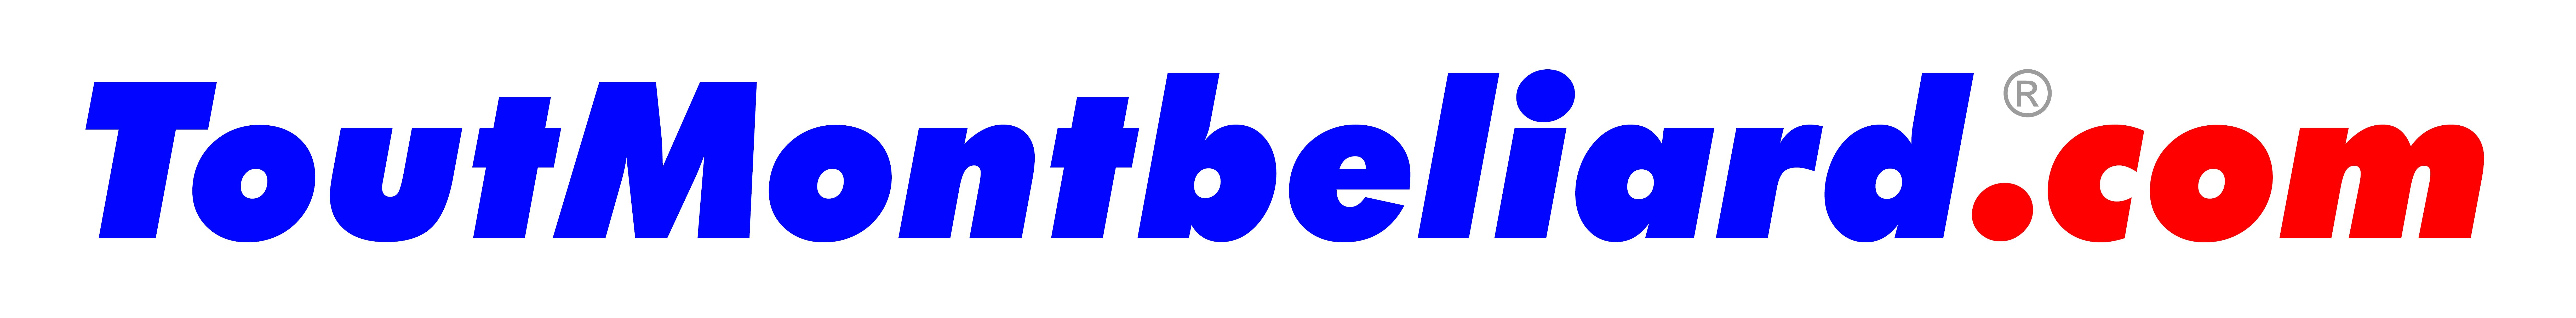 ToutMontbeliard -logo-long